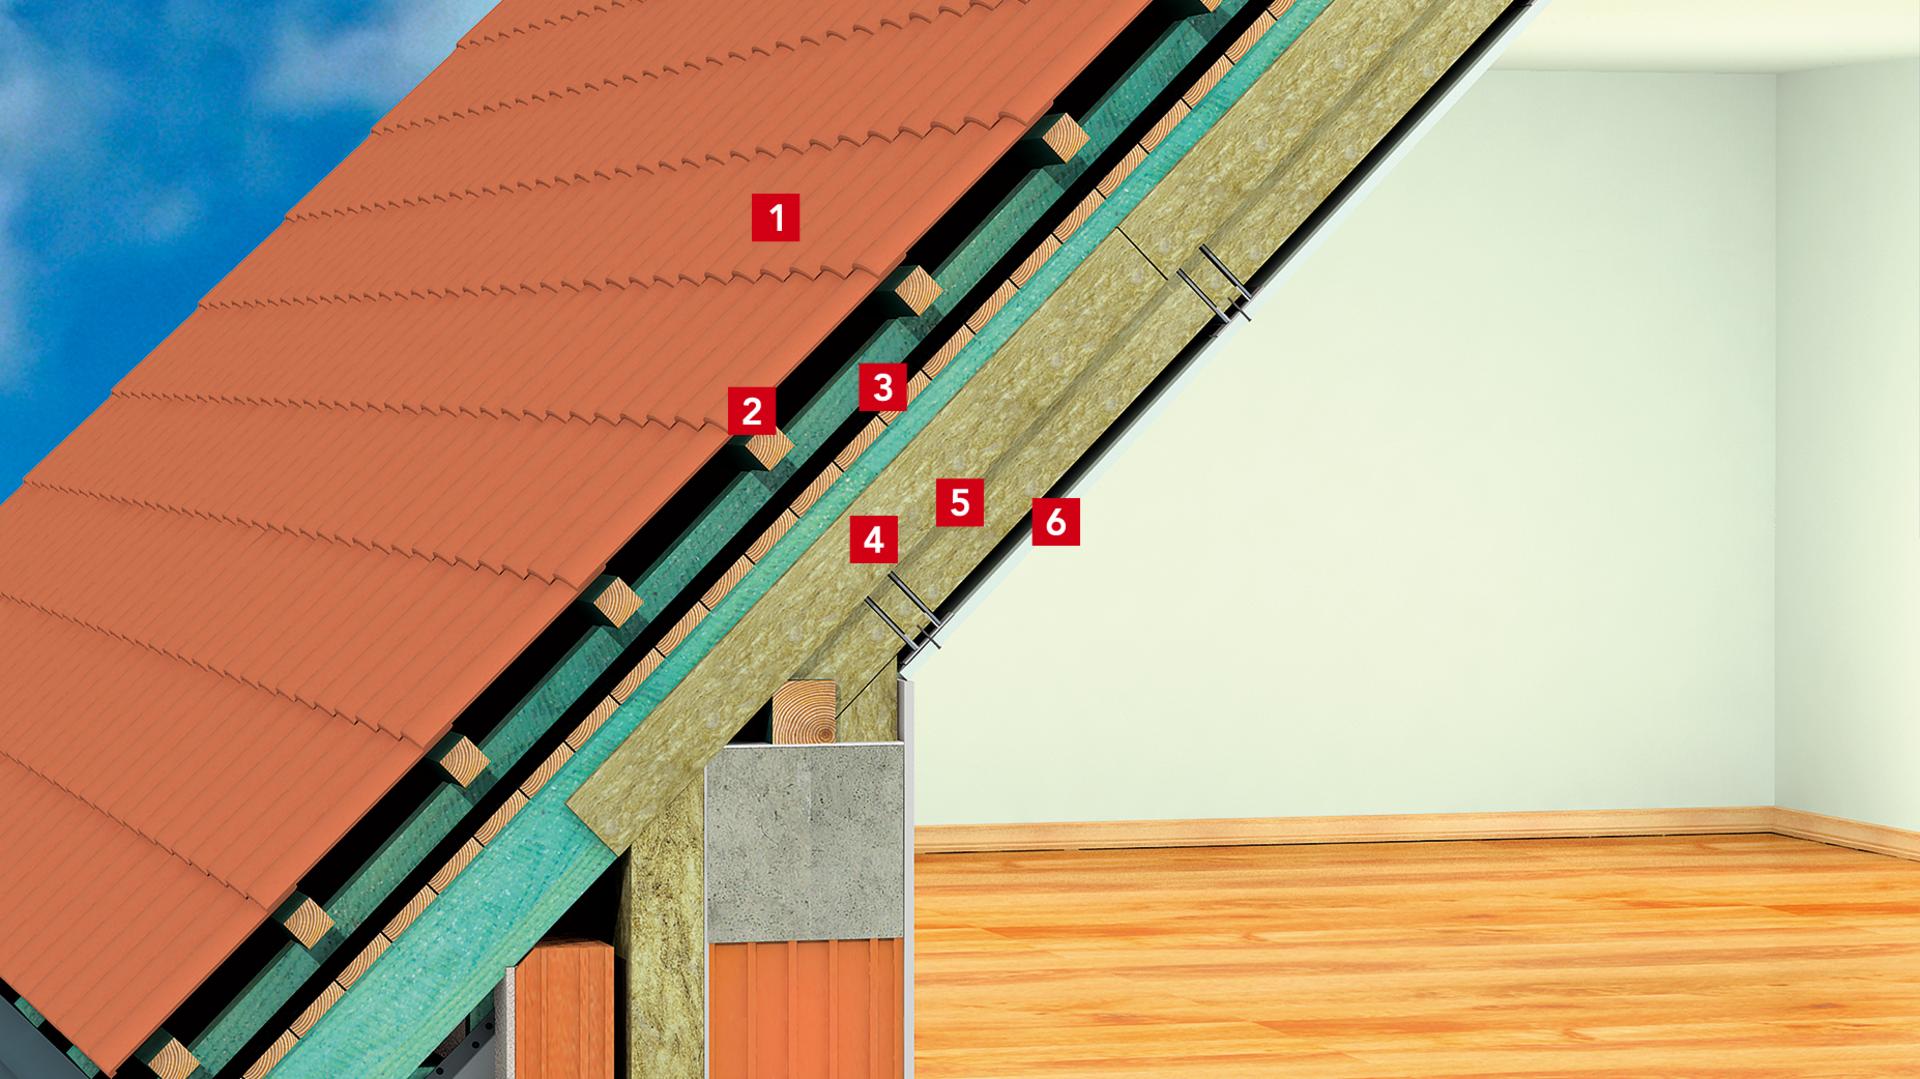 construction, application, visual